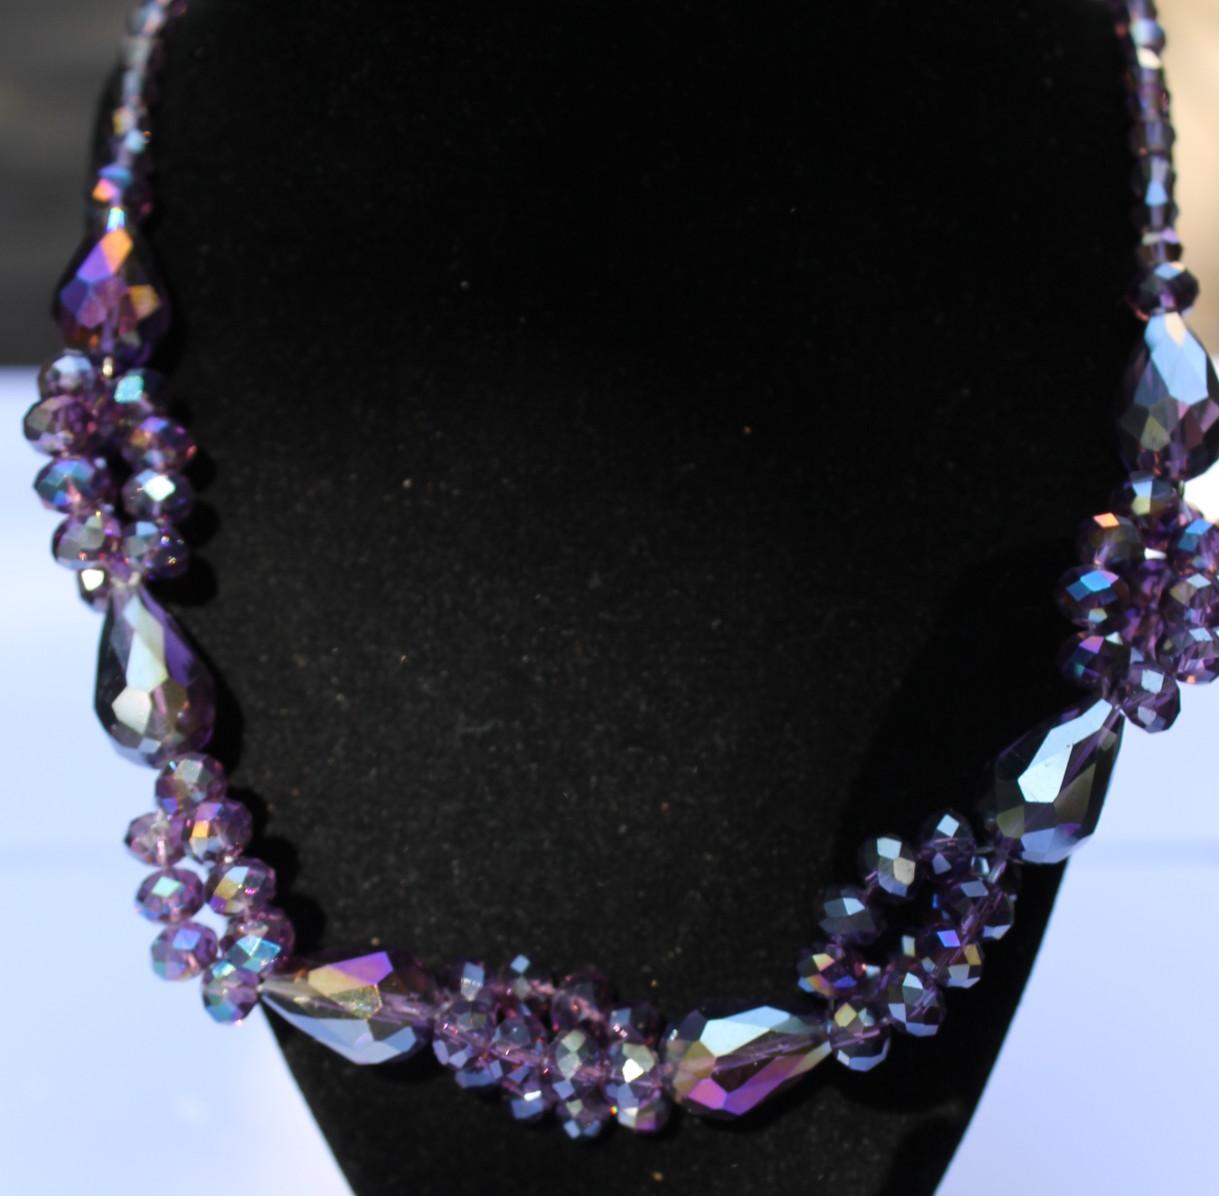 4d9e6ccf6697 Collar cristal de swarovski de diseño de moda n111 – Brazaletes y Sortijas